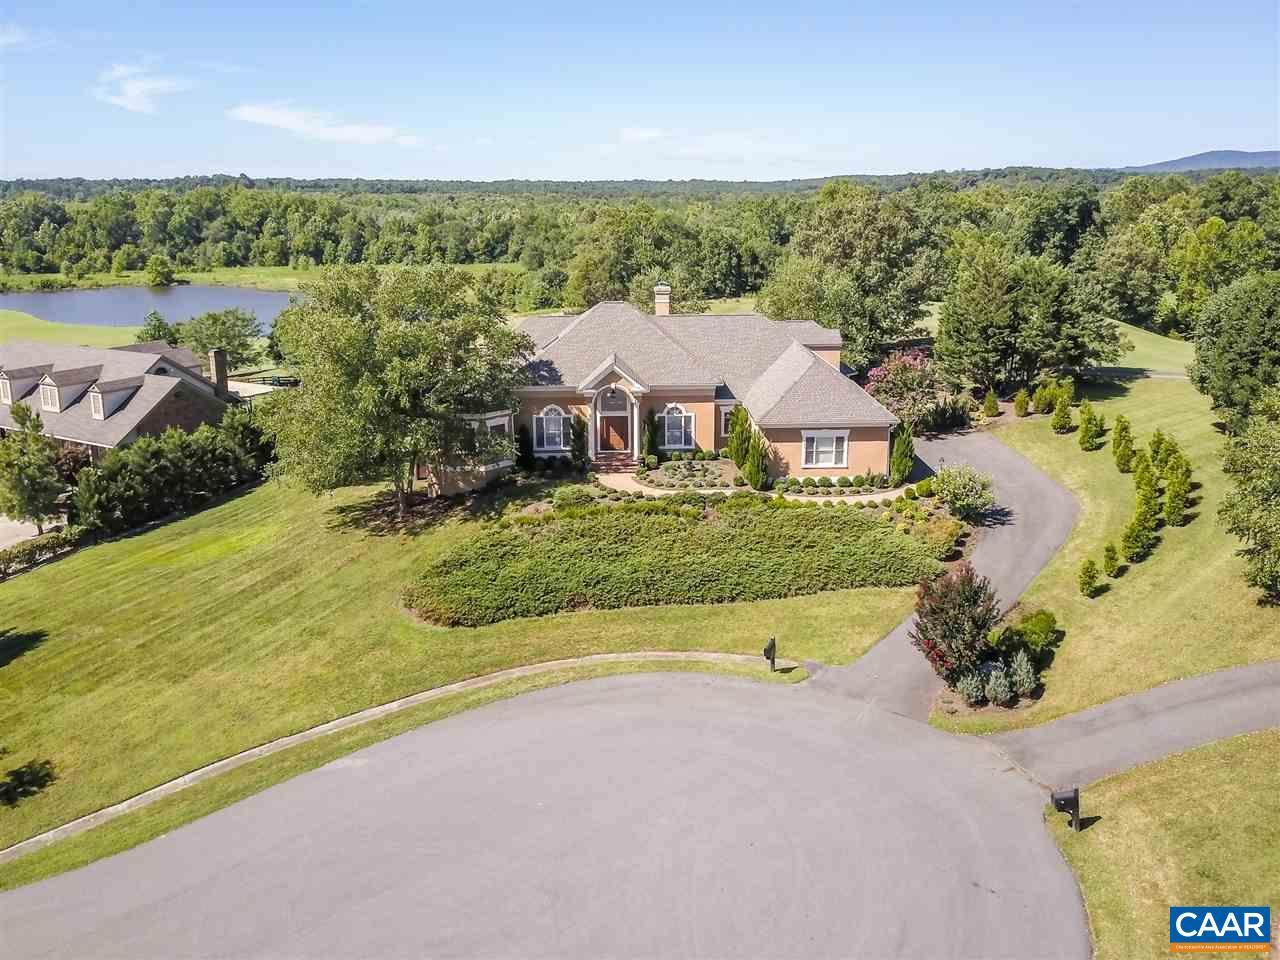 home for sale , MLS #574070, 1362 Sandown Ln